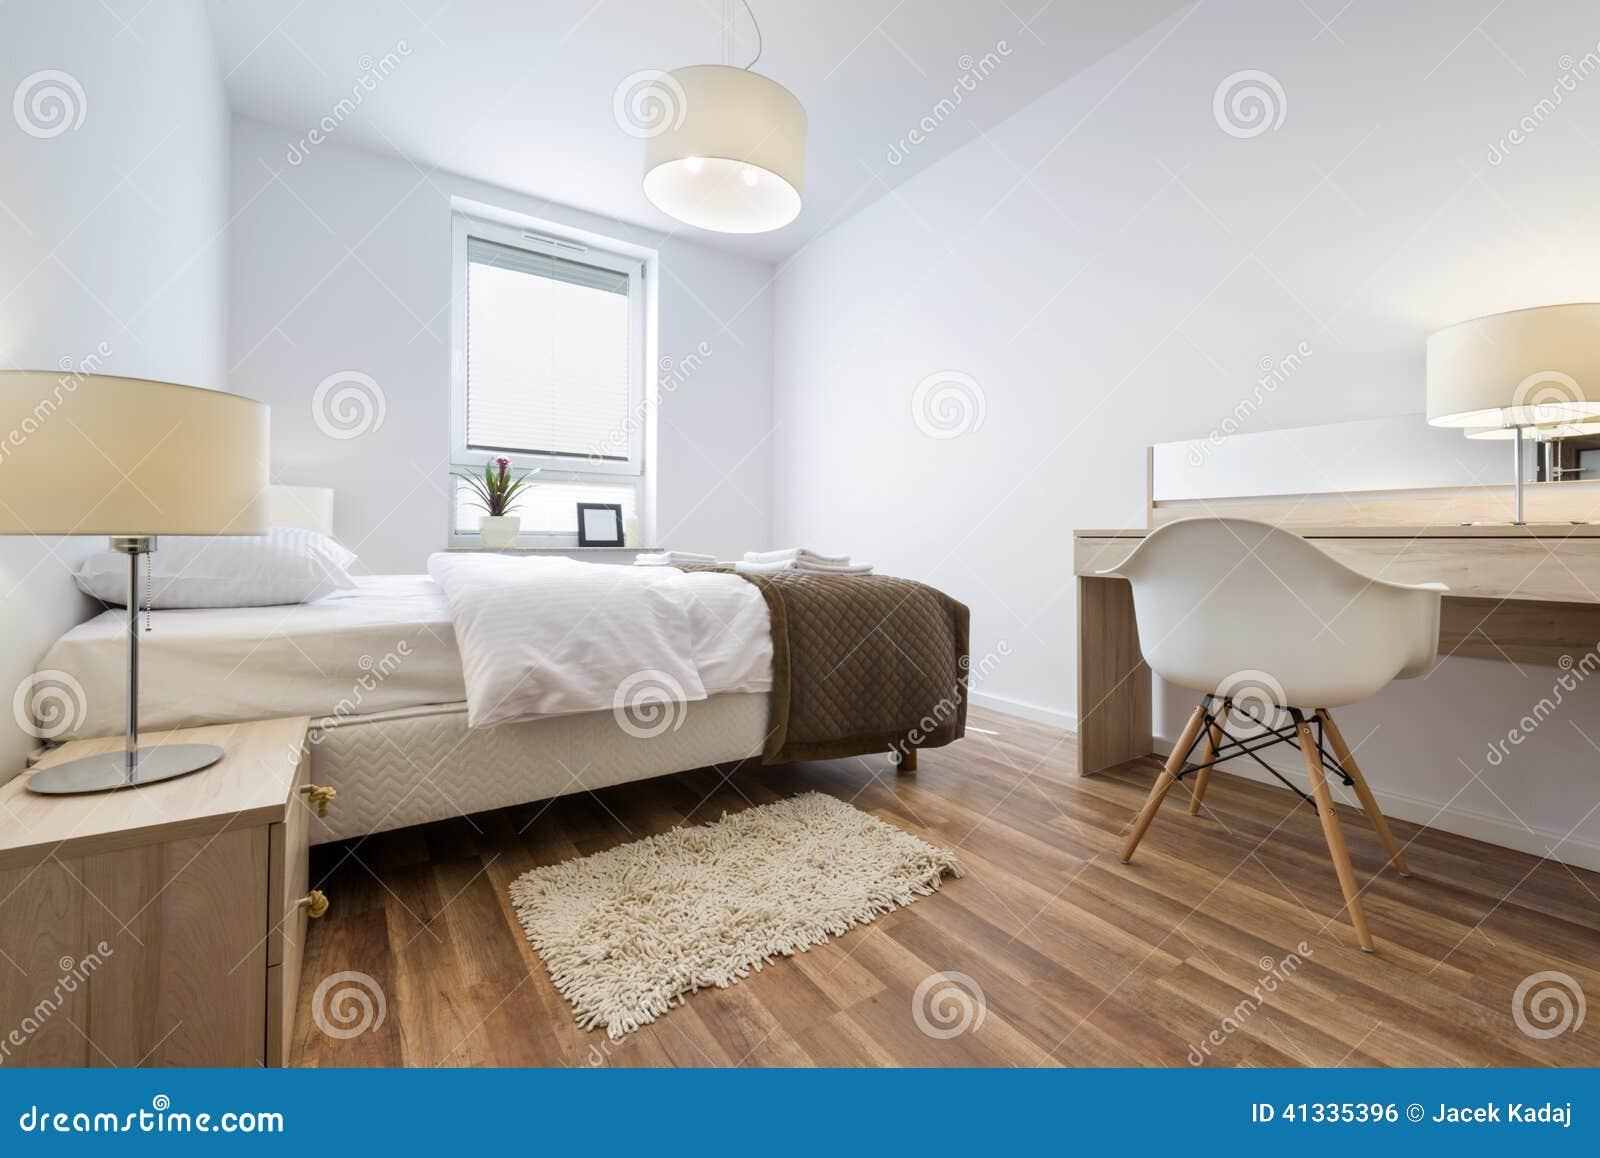 Serie För Inredesign: Modernt Sovrum Arkivfoto - Bild: 41335396